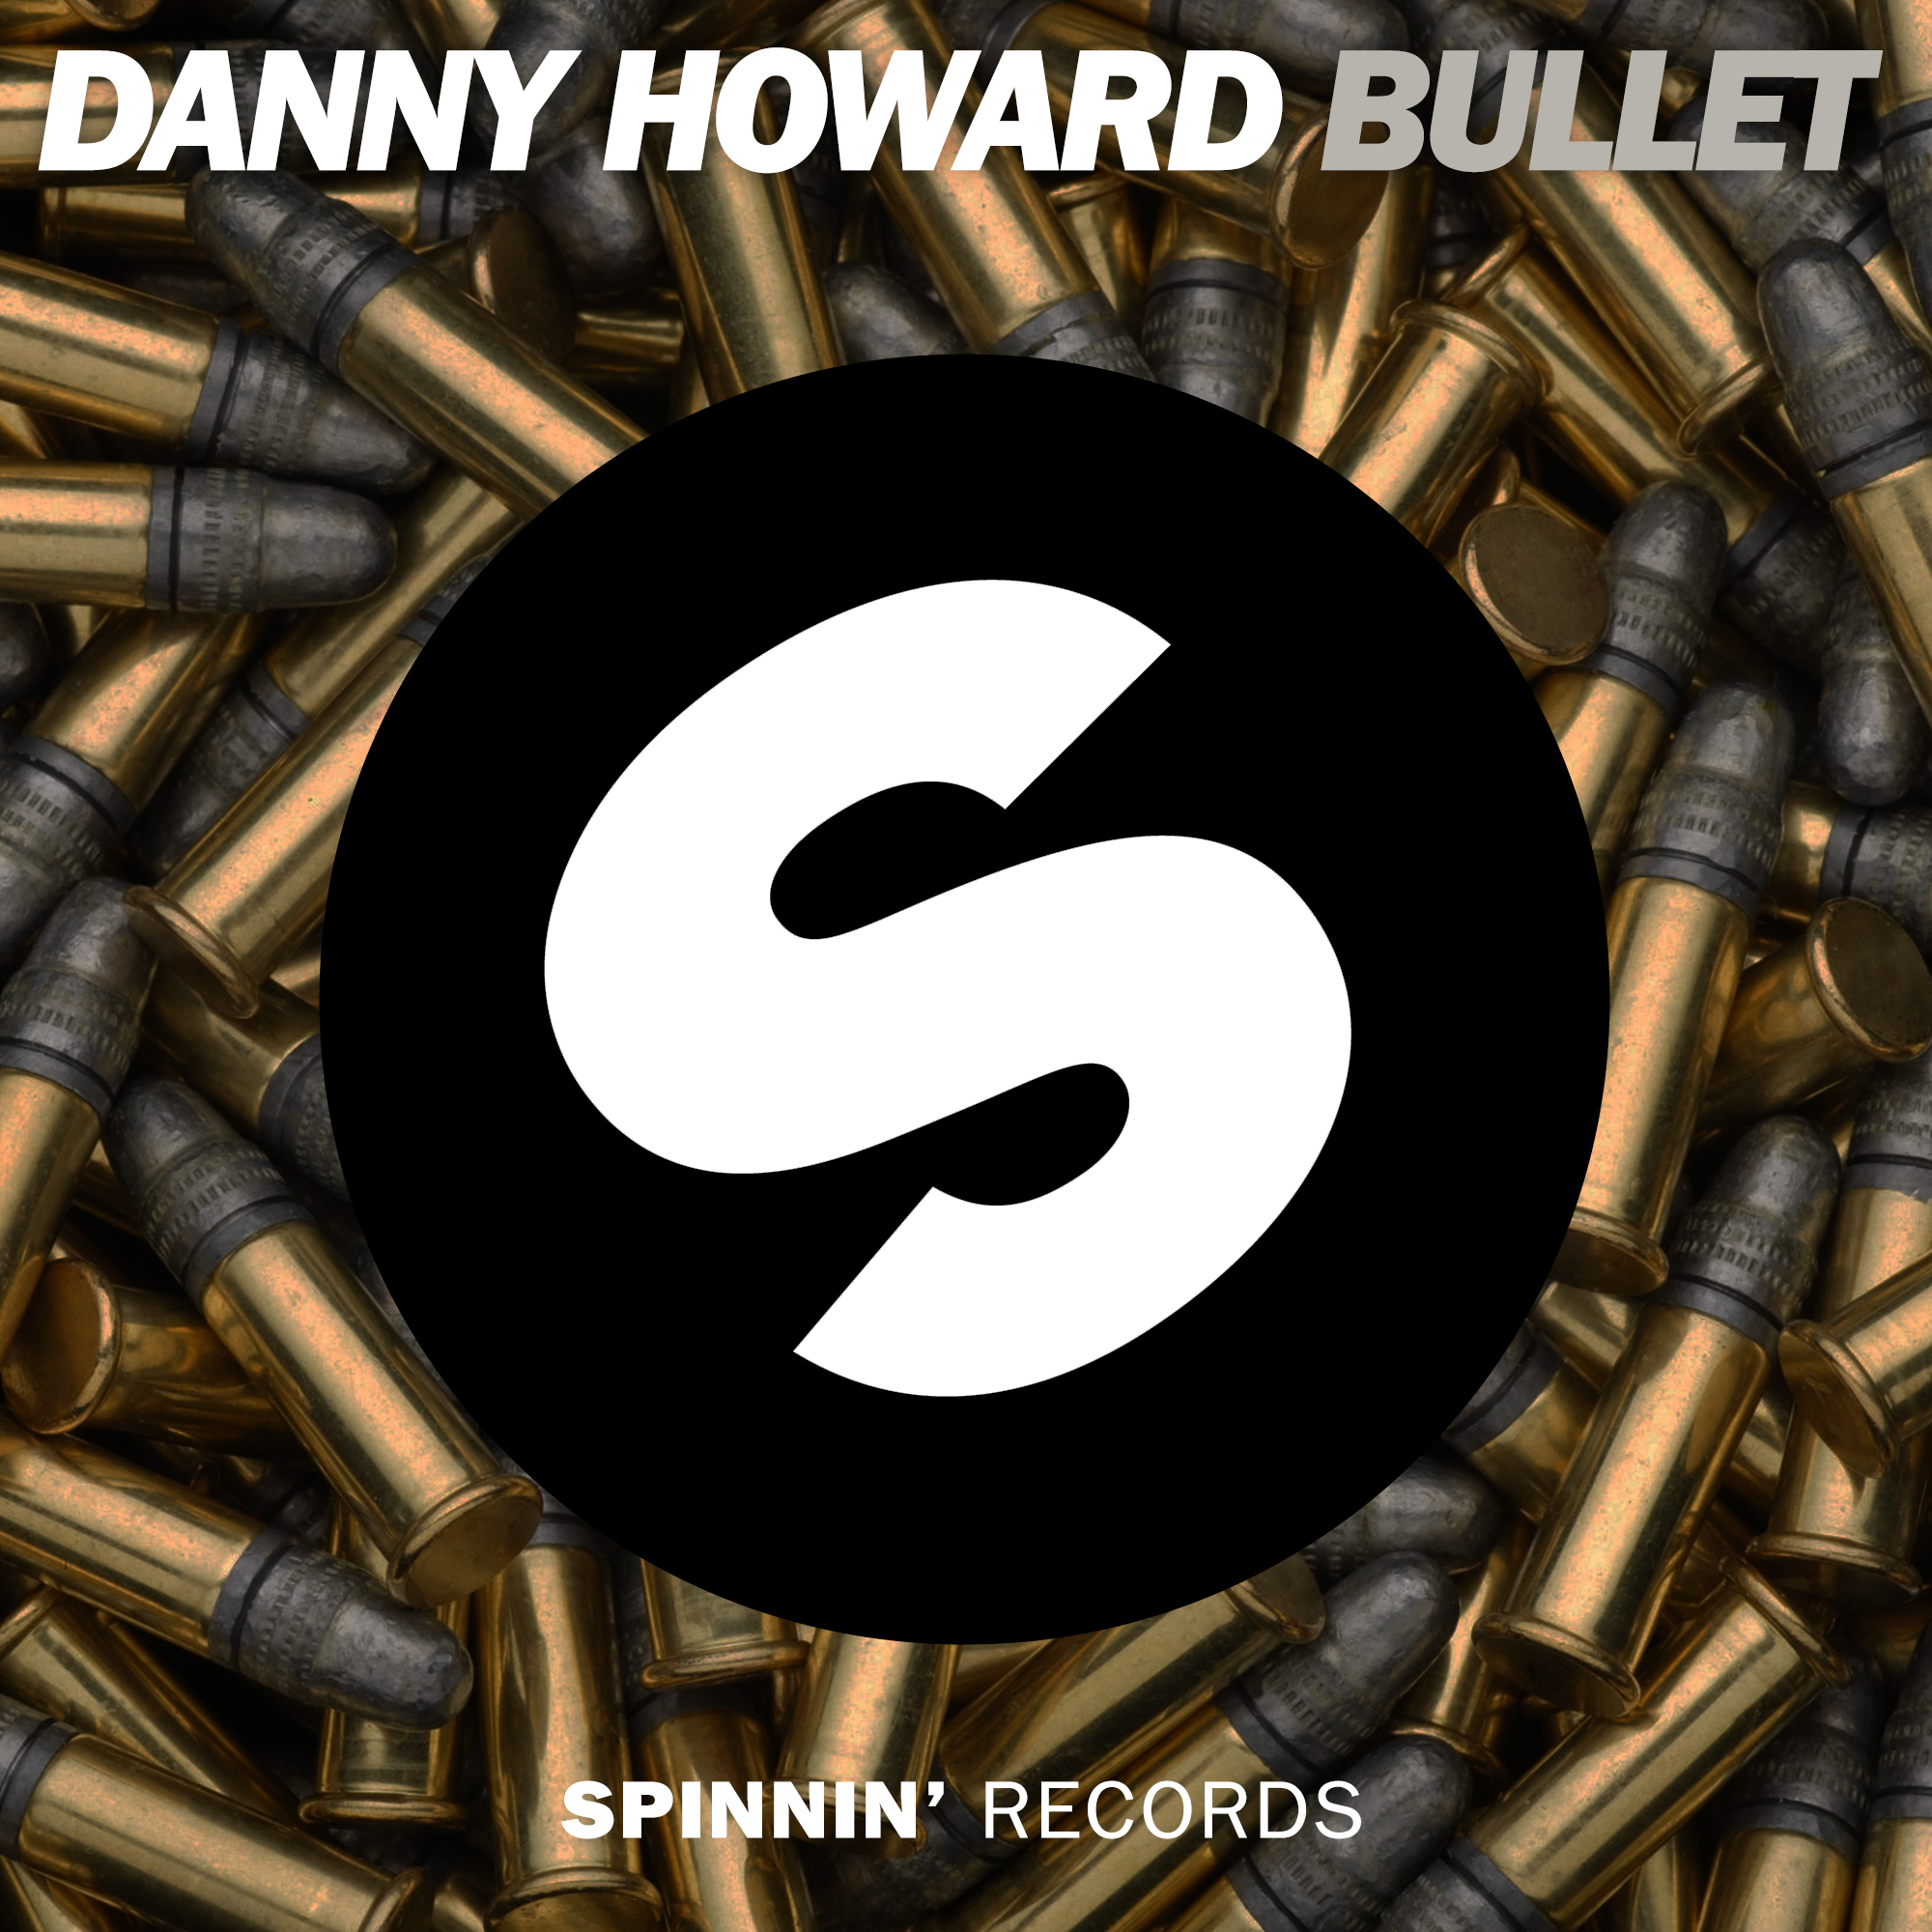 Danny Howard Bullet